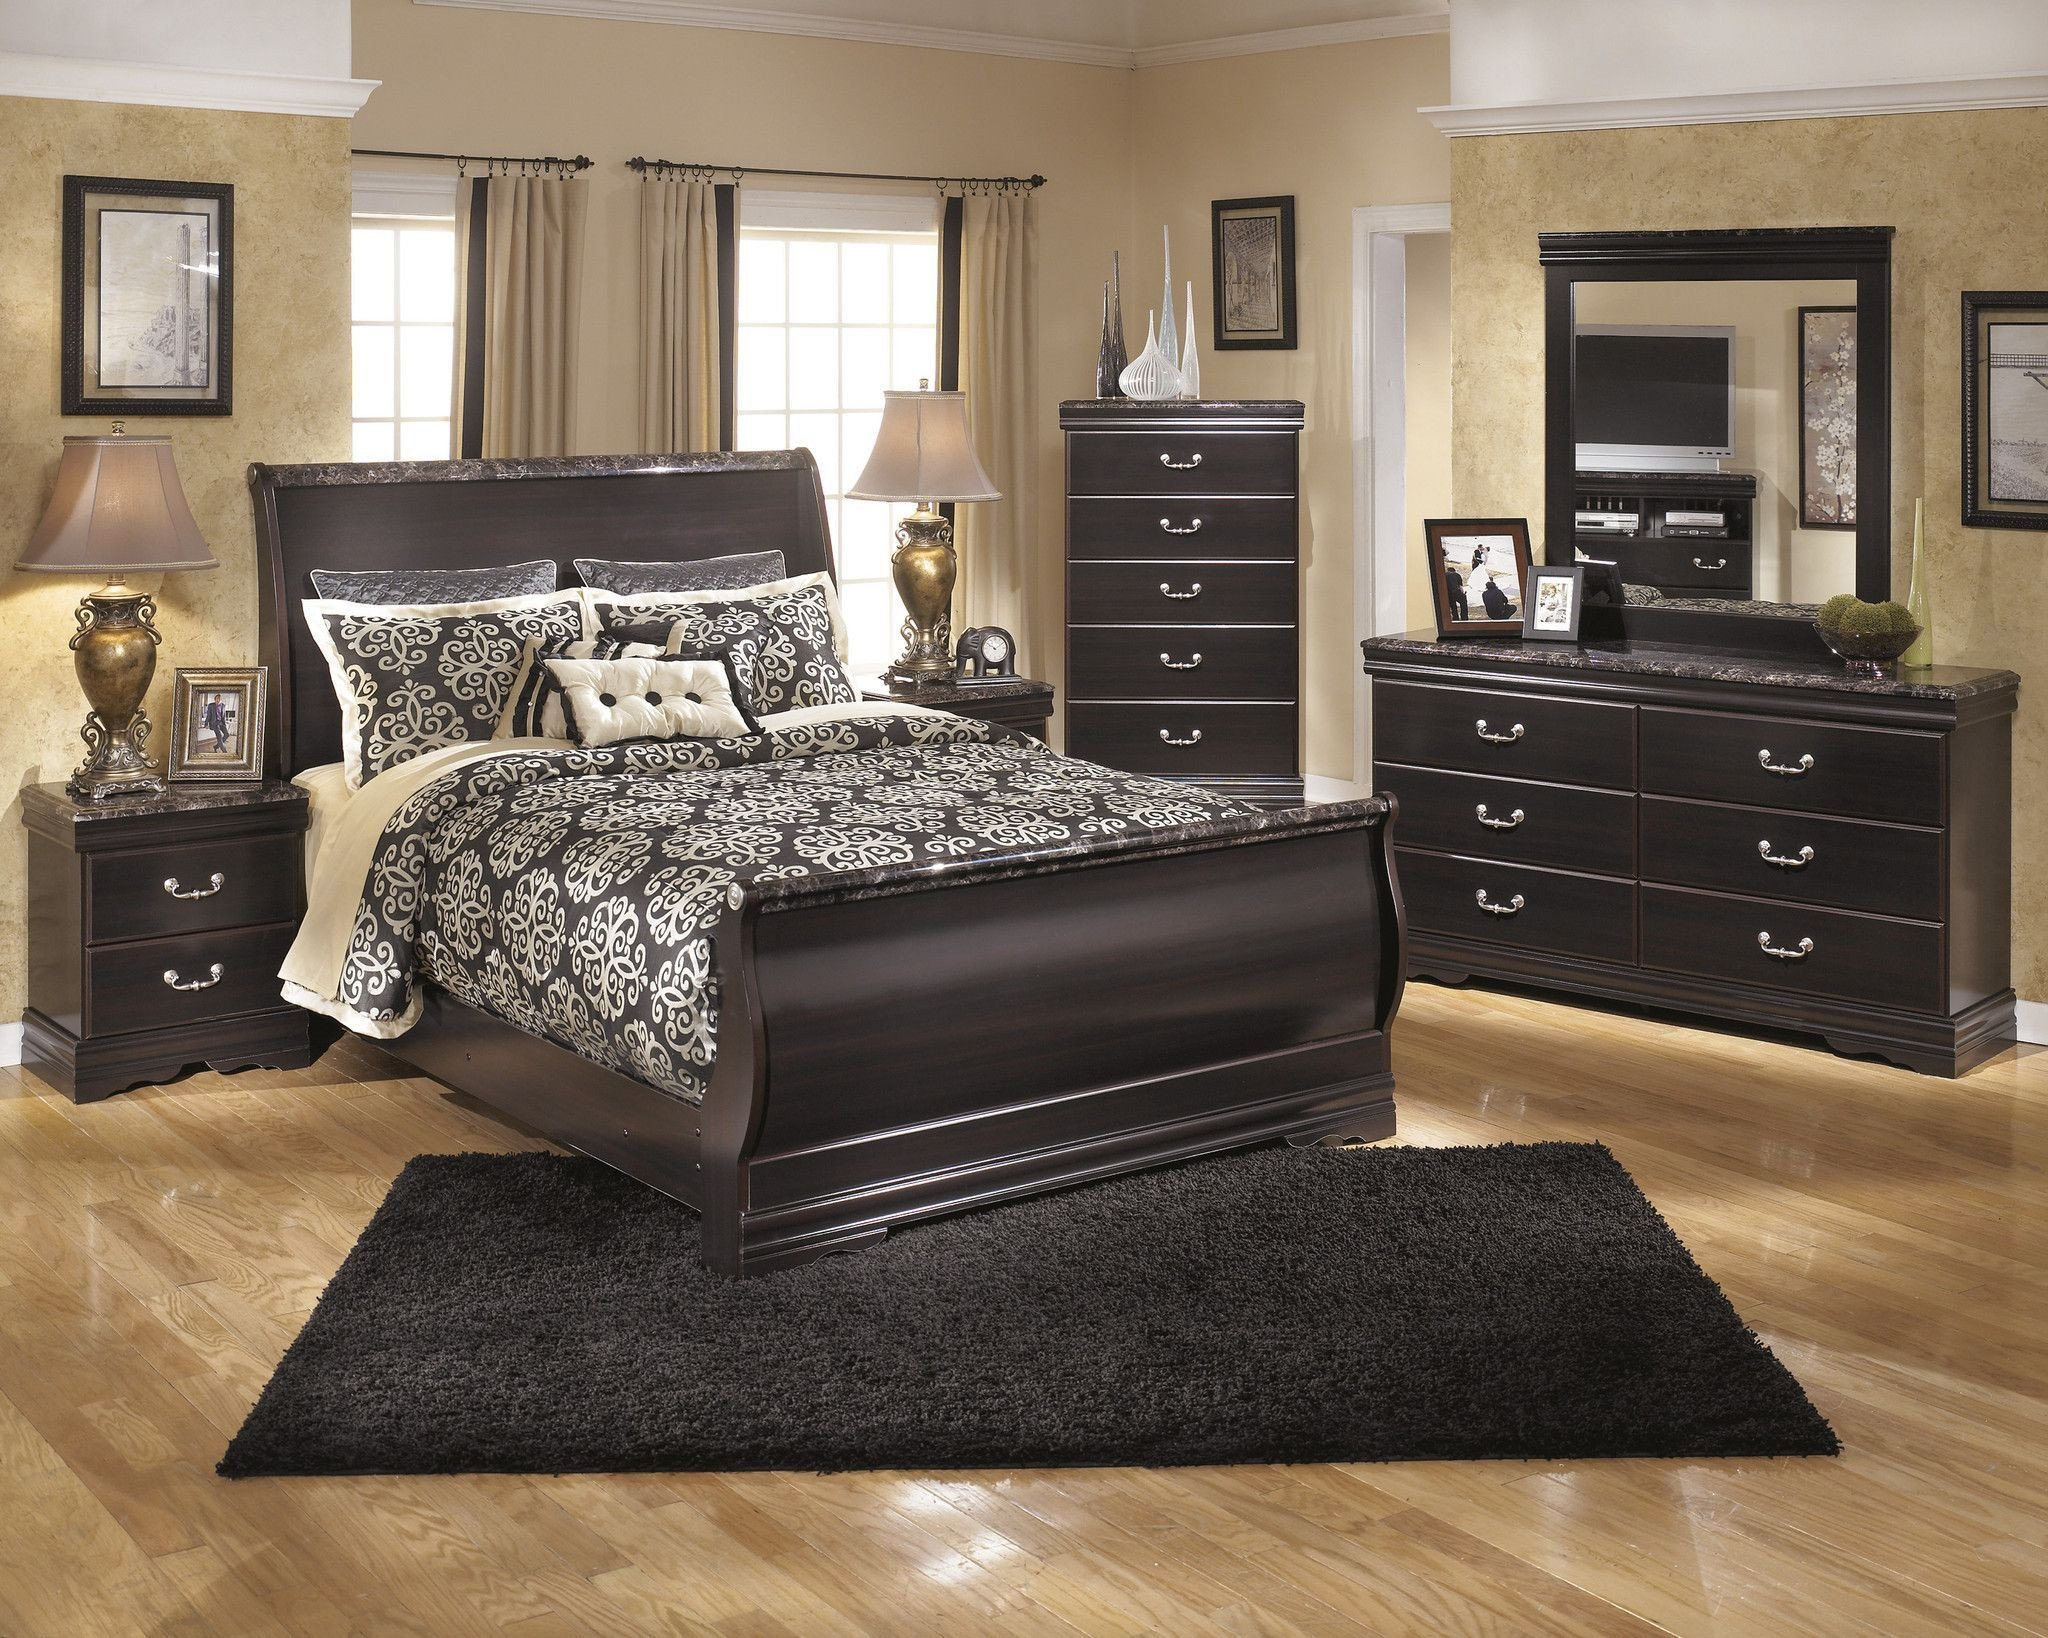 Coal Creek Bedroom Set Inspirational Katherine Pierce Dbxjxkjddj On Pinterest